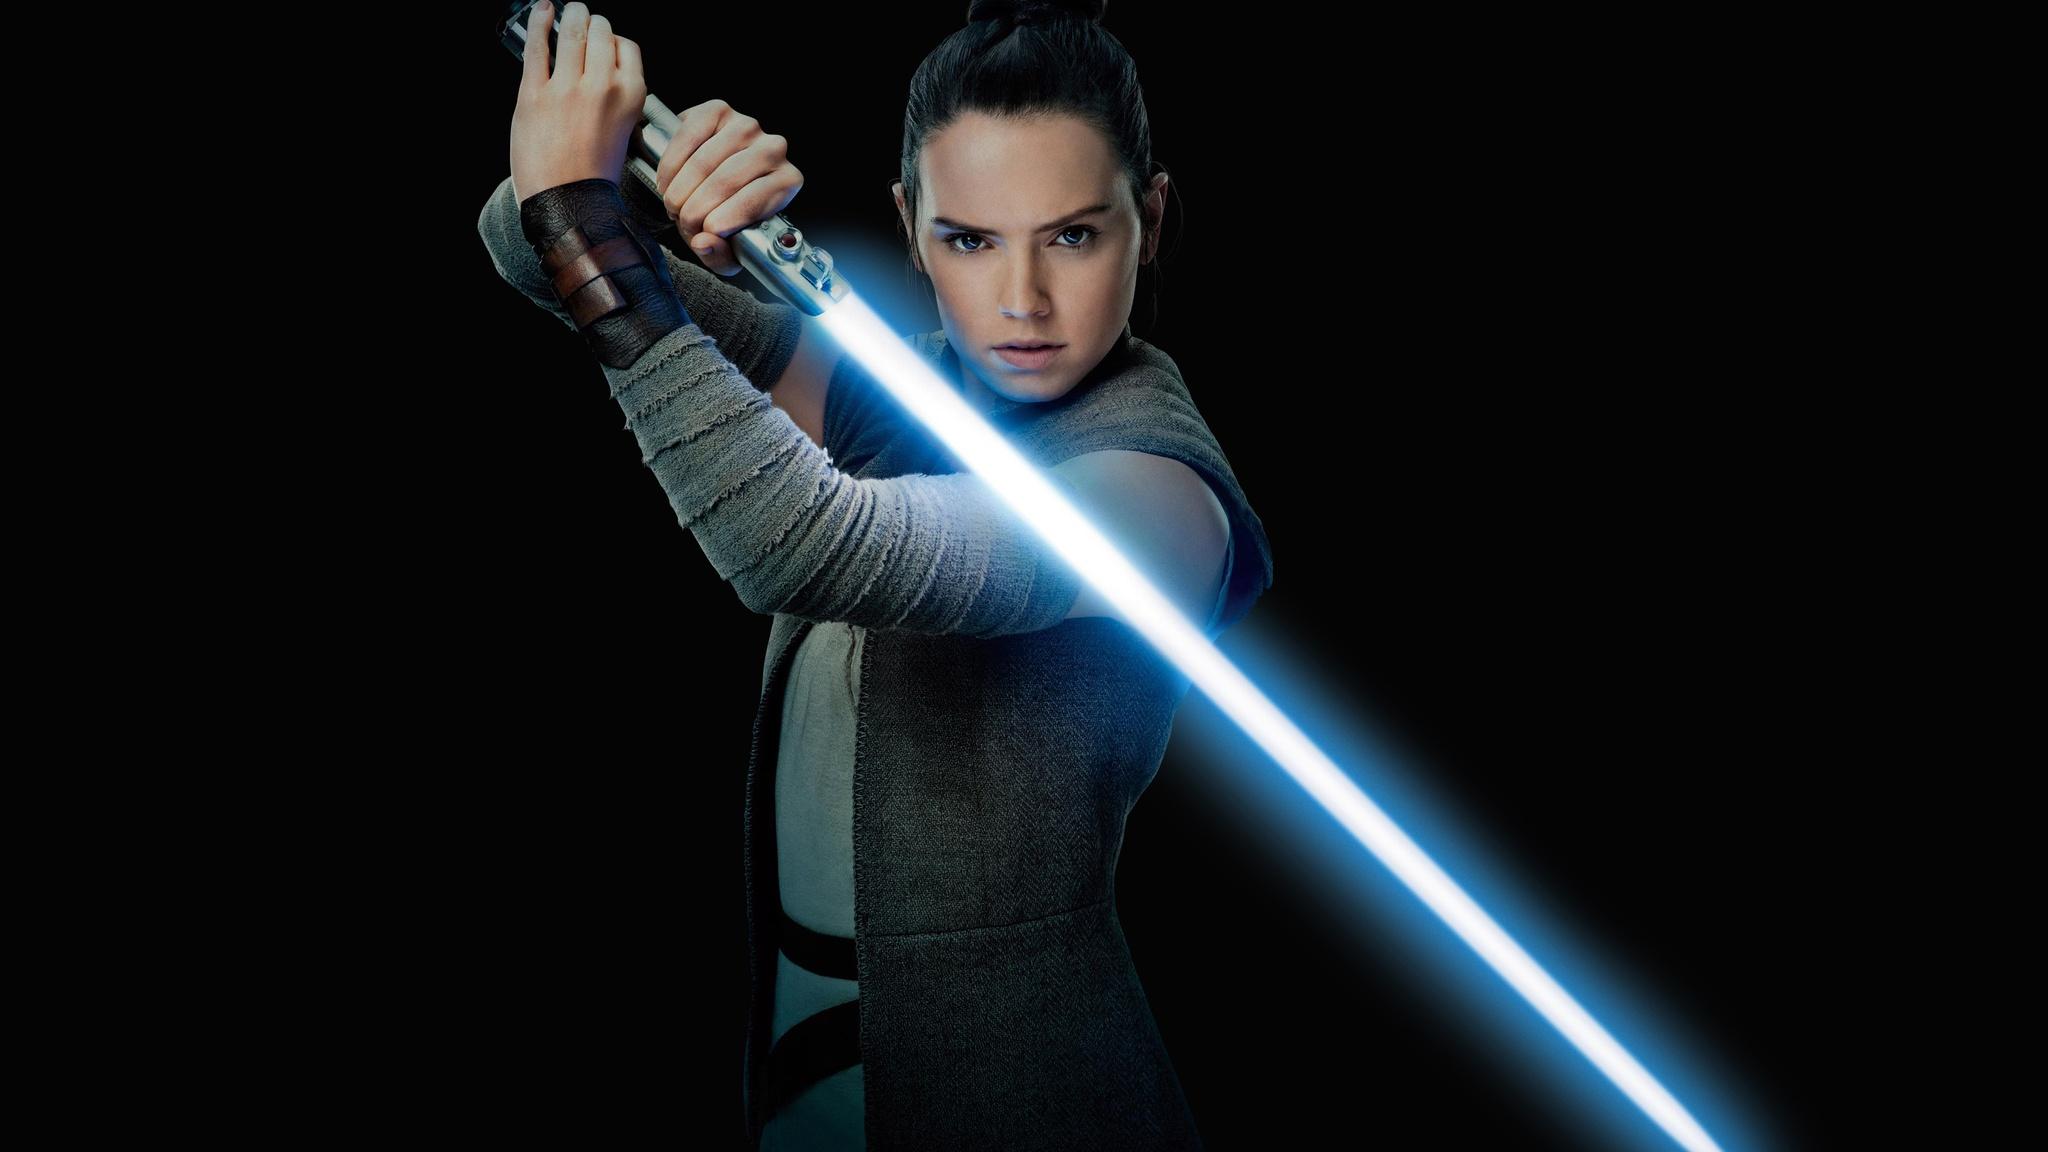 2048x1152 Daisy Ridley As Rey Star Wars In The Last Jedi